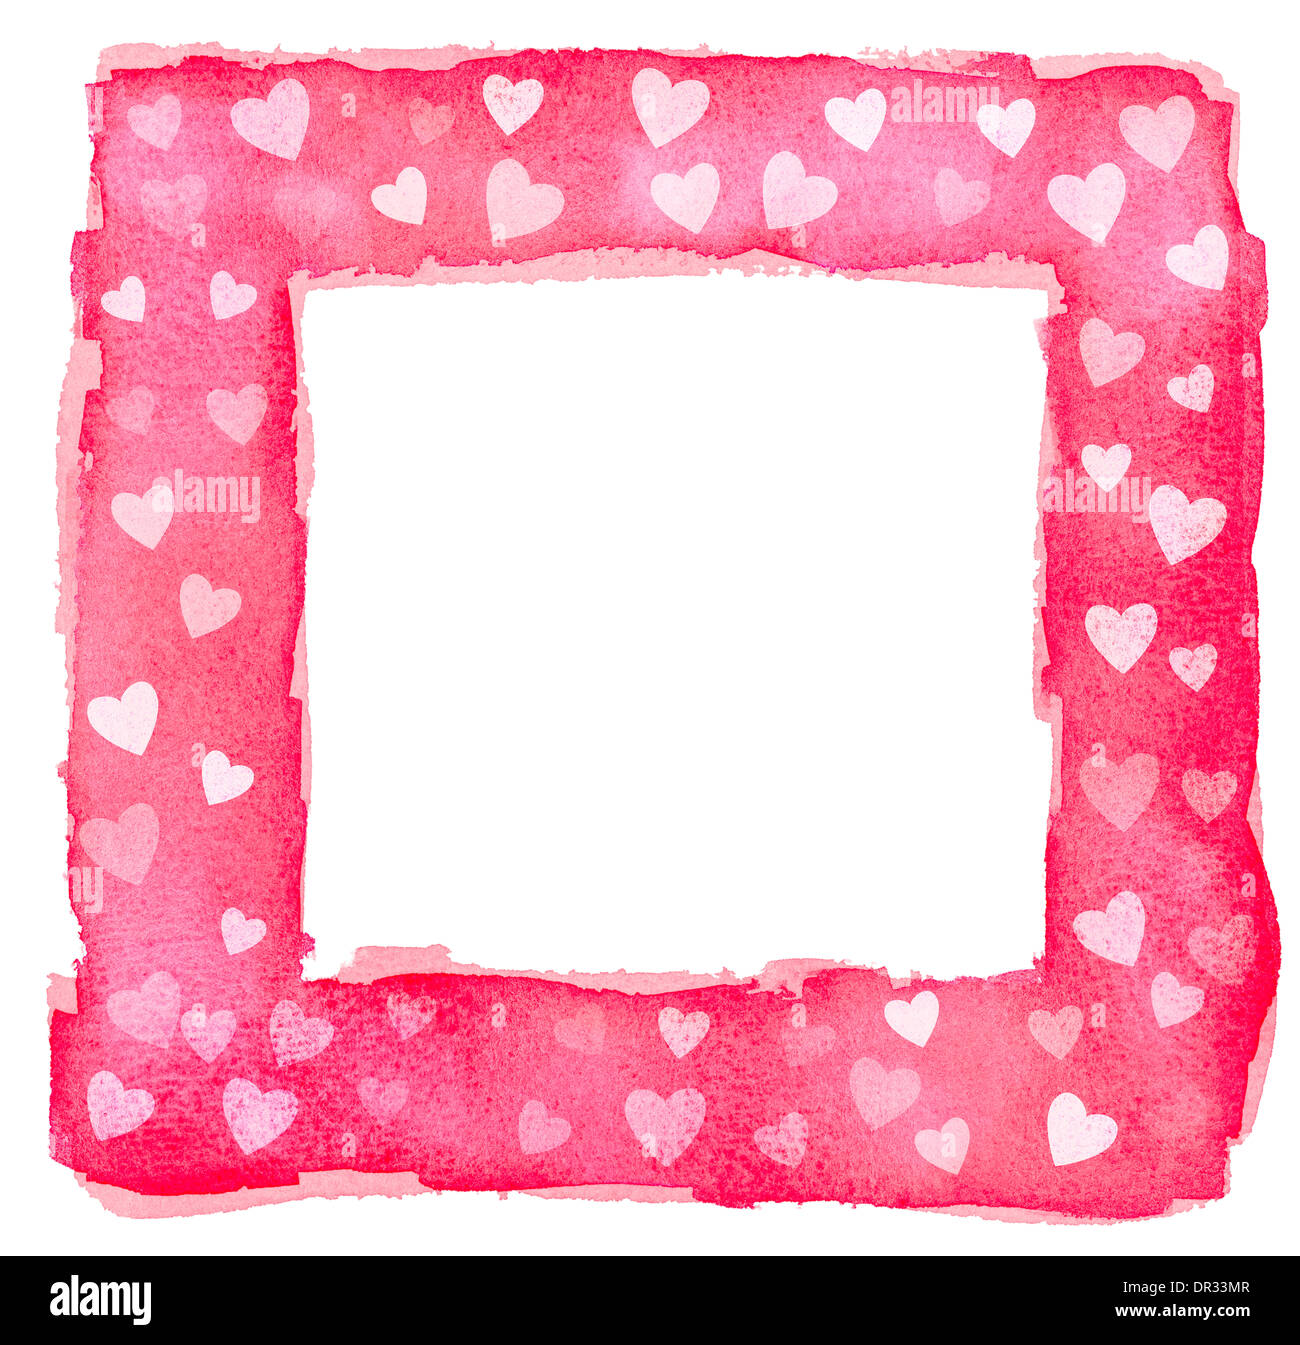 Abstrakt rot rosa und weißes Aquarell Herzen Quadrat-Frame-Rahmen ...